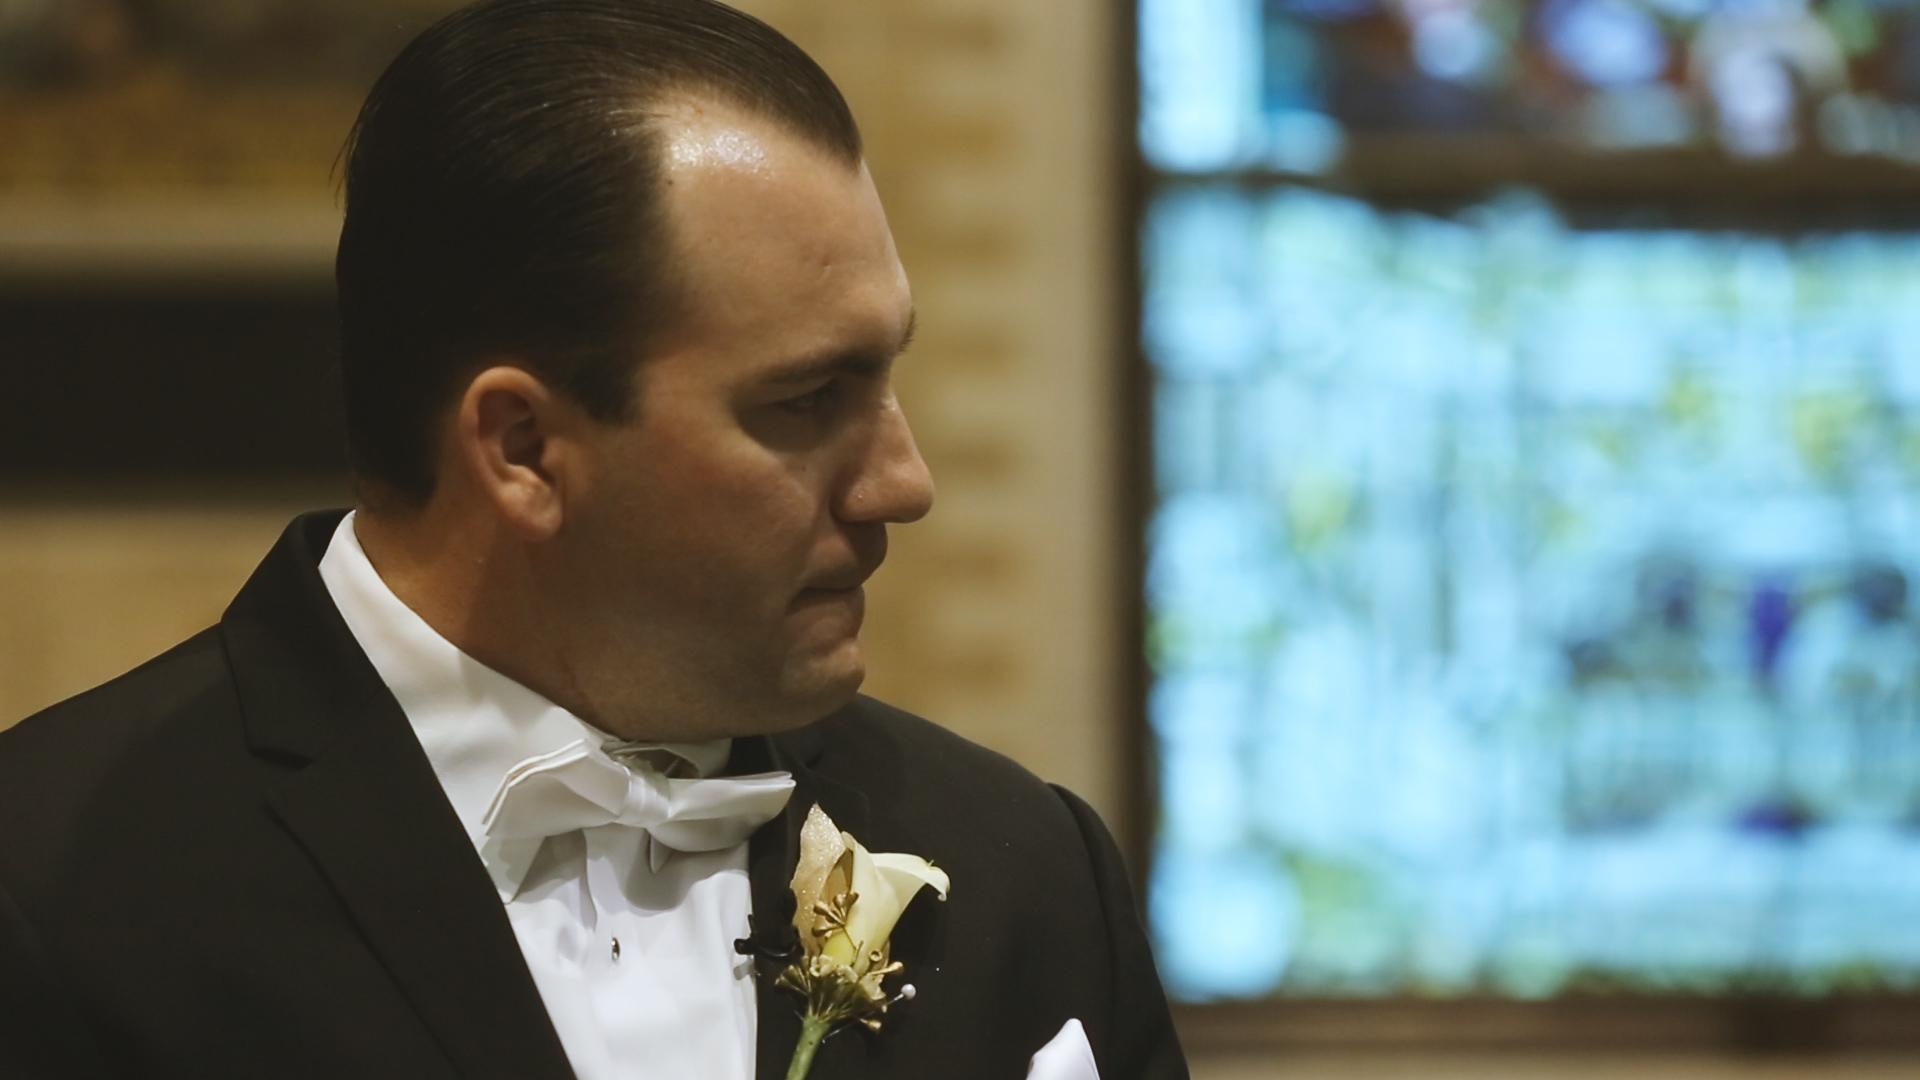 BrideFilm_Baton Rouge Wedding Videography_groom wedding reaction